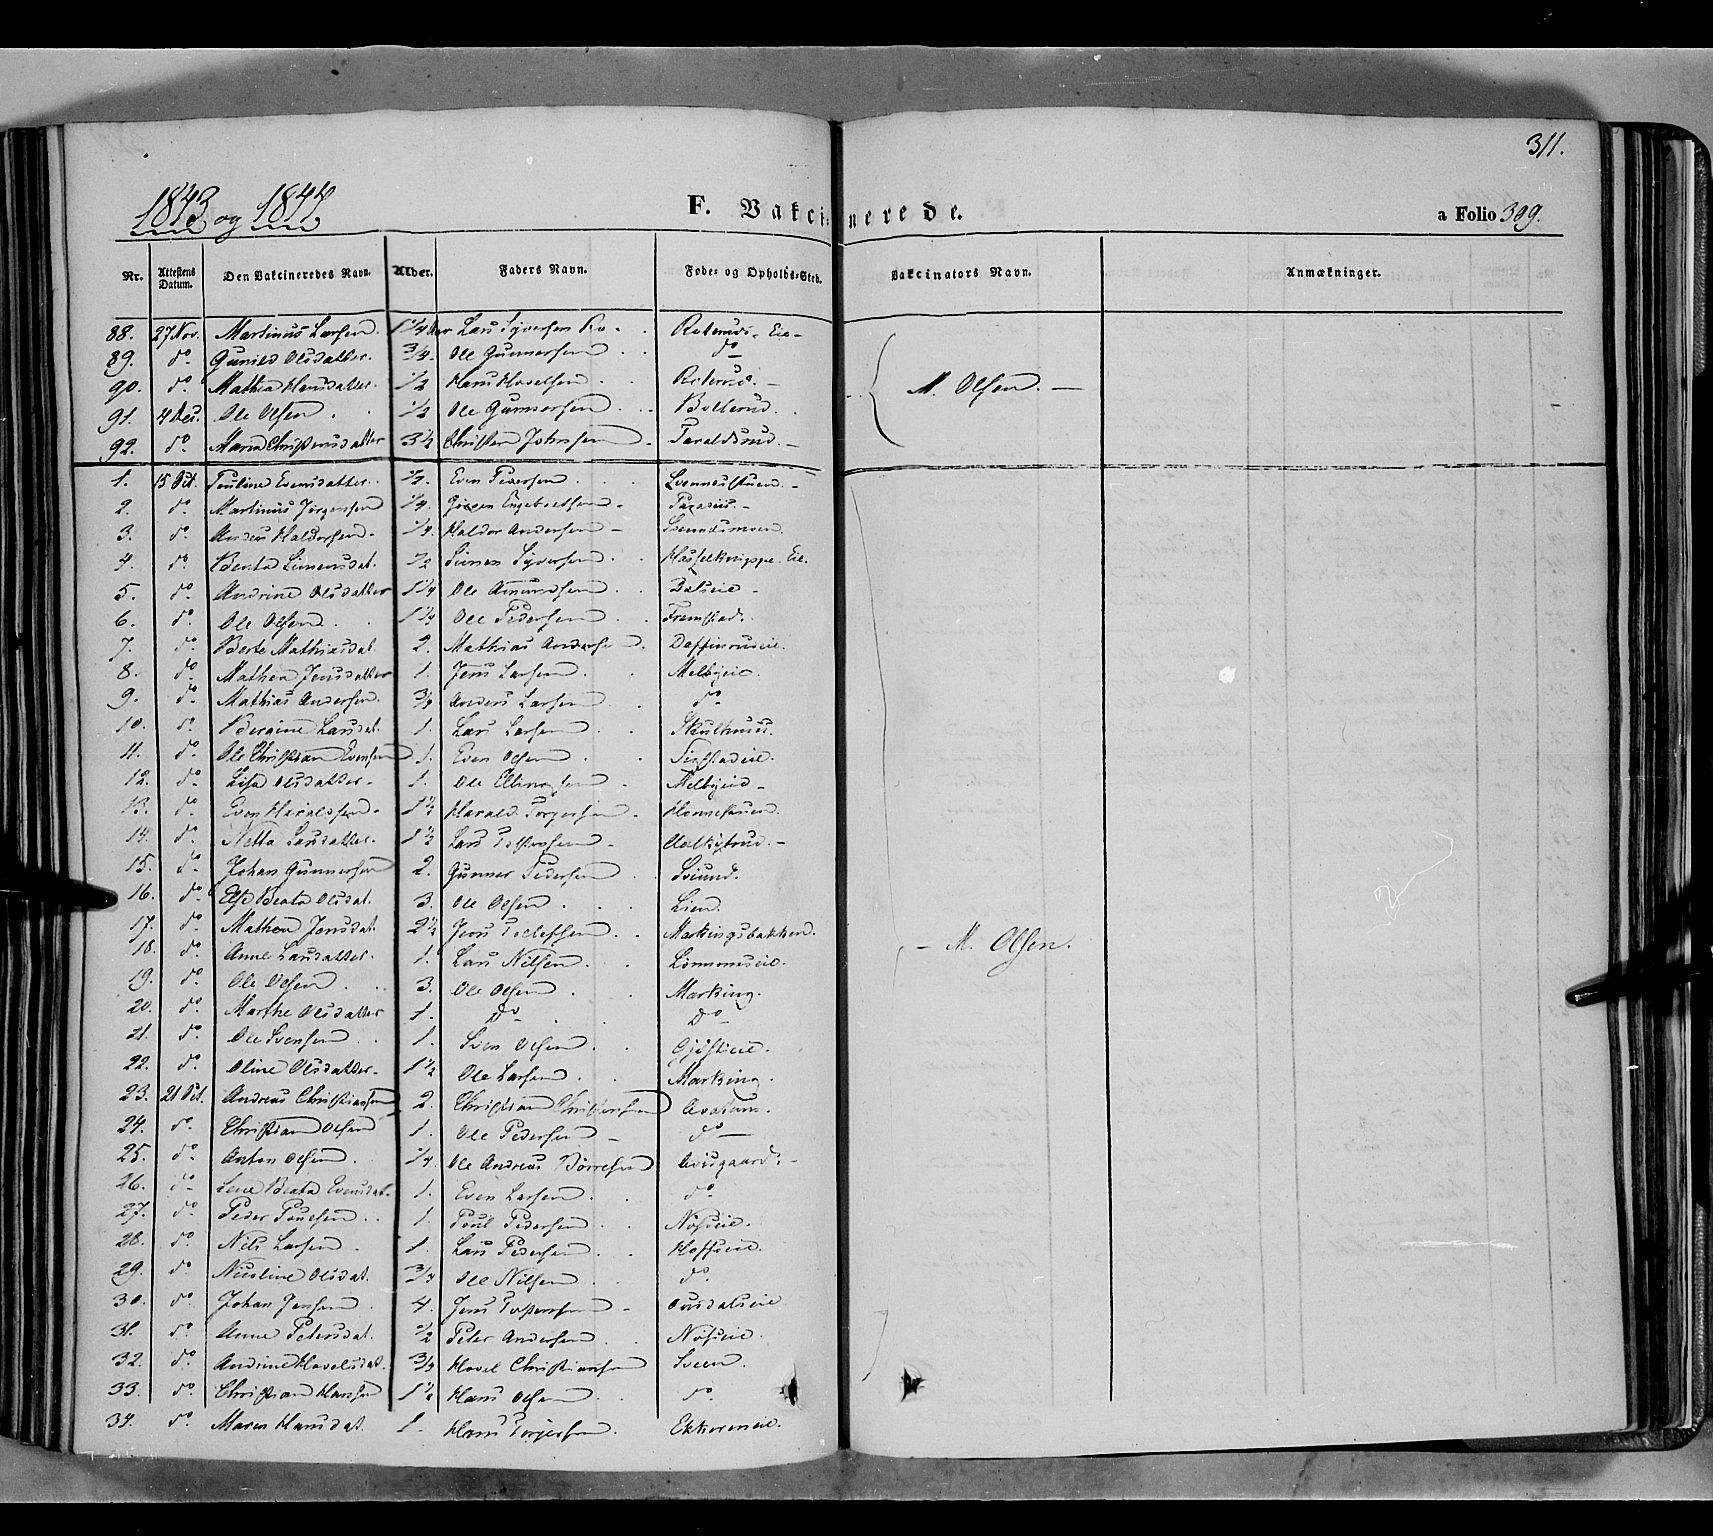 SAH, Biri prestekontor, Ministerialbok nr. 5, 1843-1854, s. 311